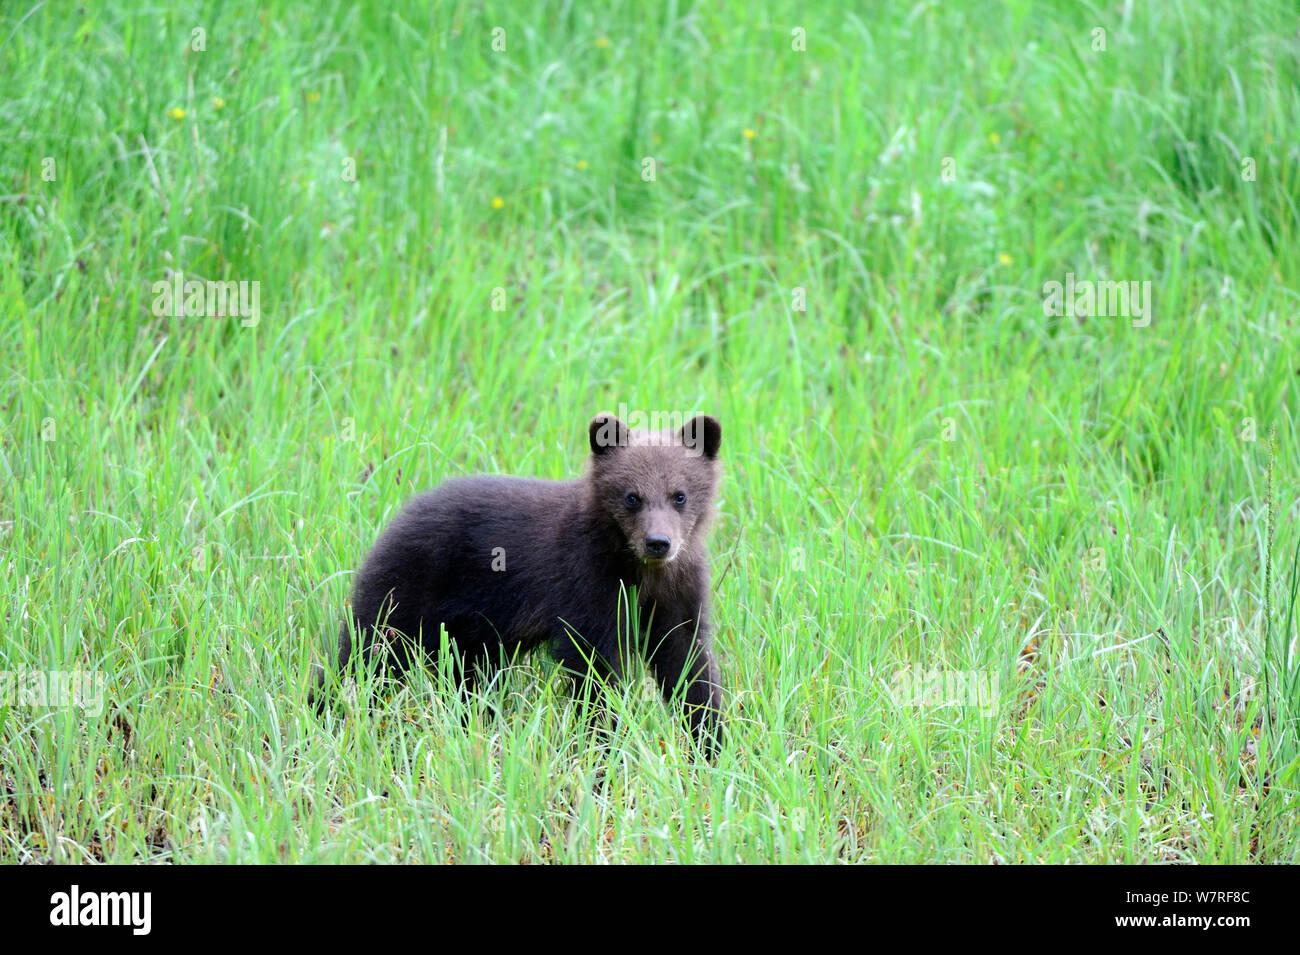 Grizzly bear spring cub (Ursus arctos horribilis) Khutzeymateen Grizzly Bear Sanctuary, British Columbia, Canada, June. Stock Photo